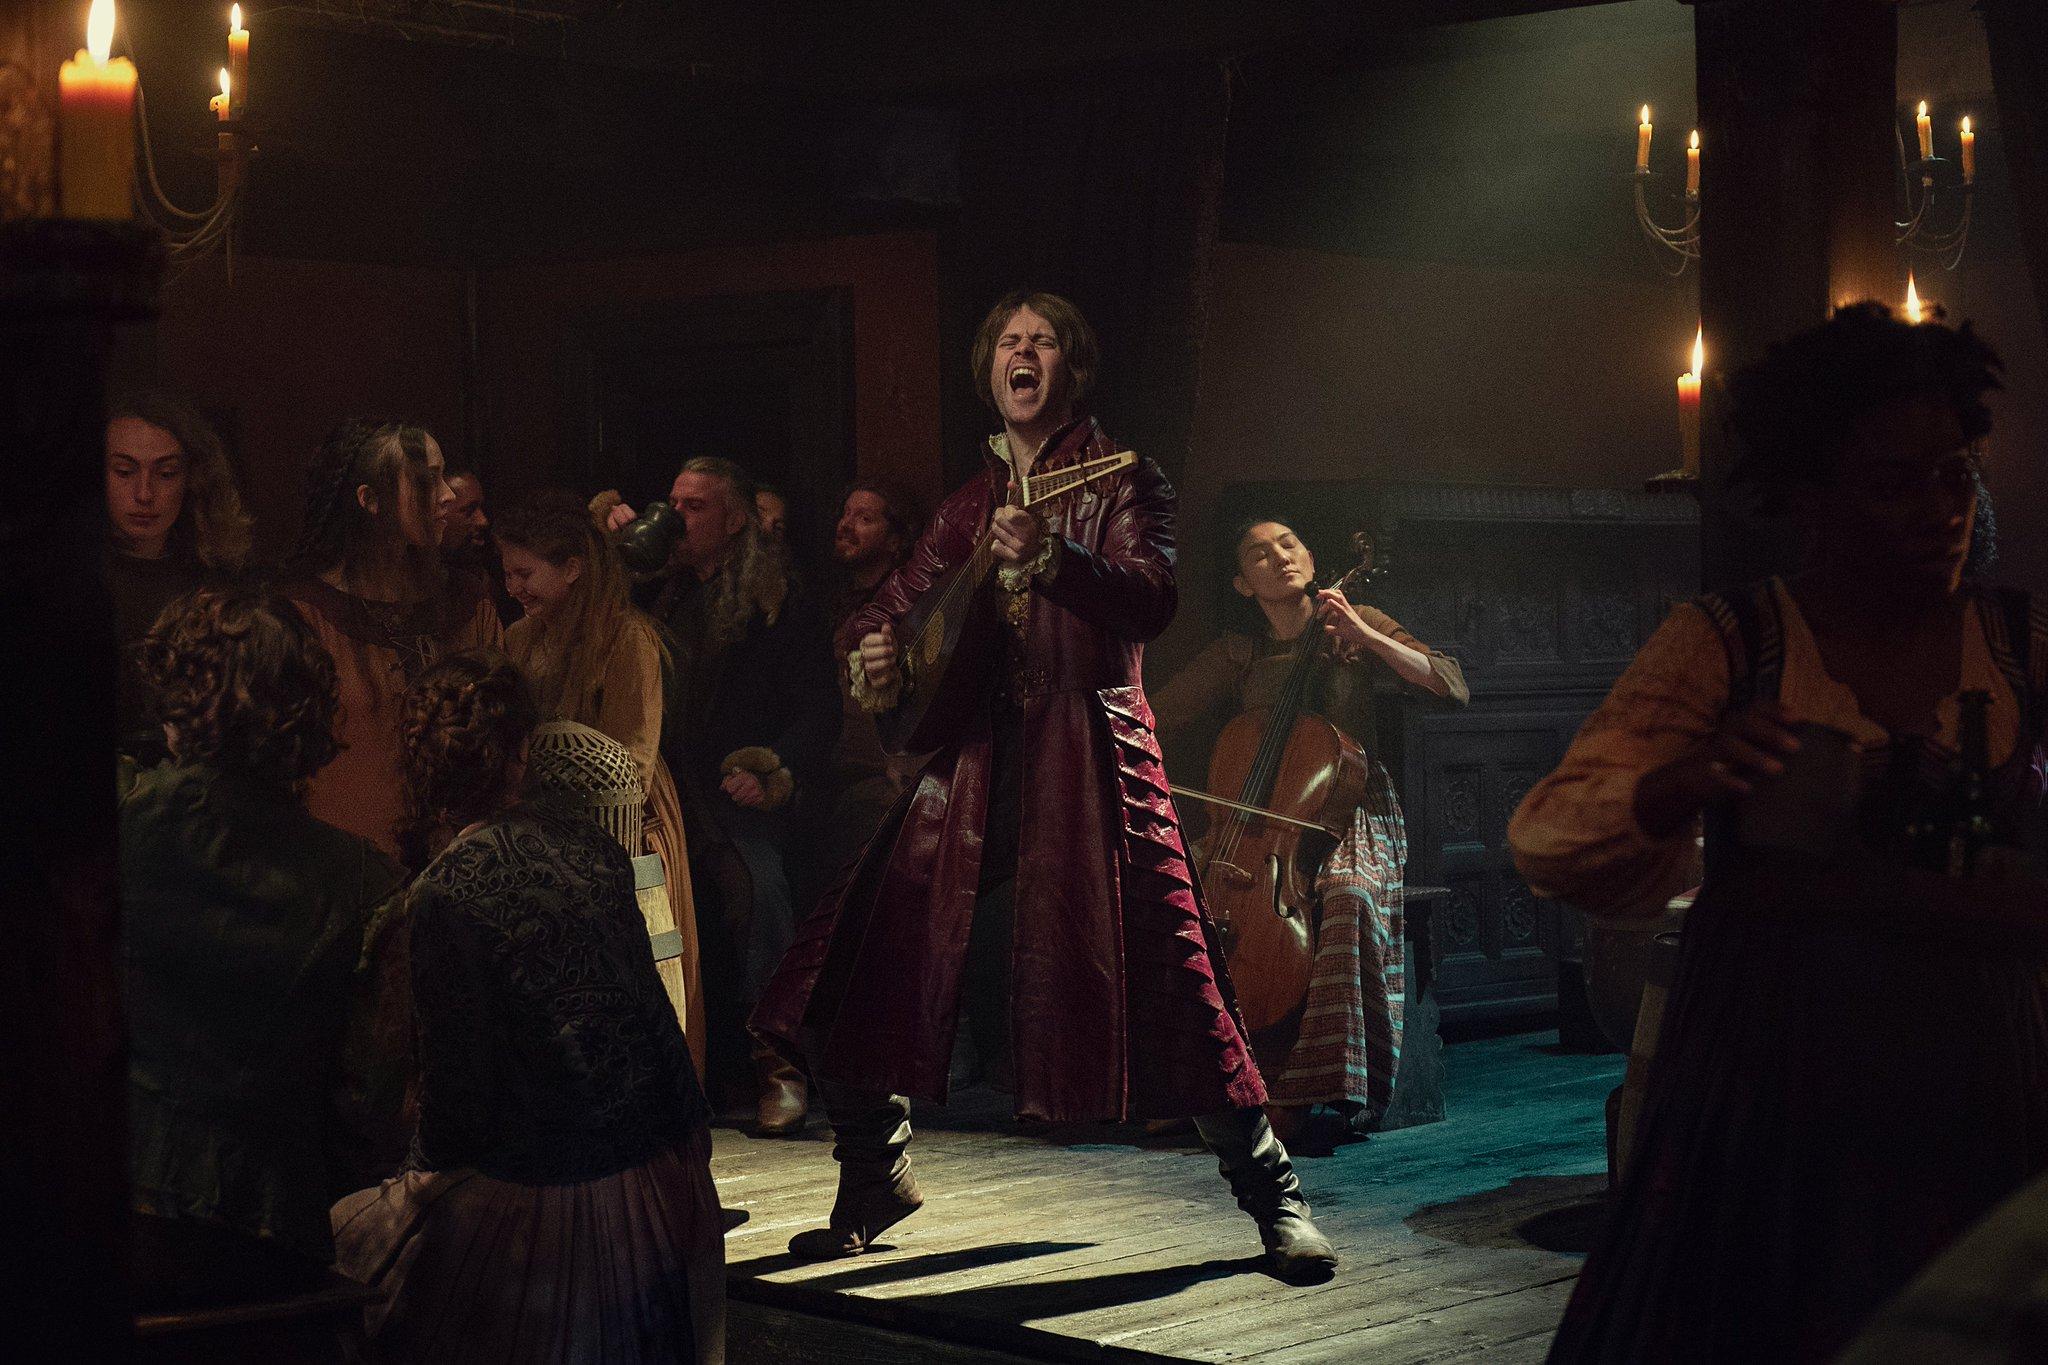 Jaskier from The Witcher season 2 on Netflix